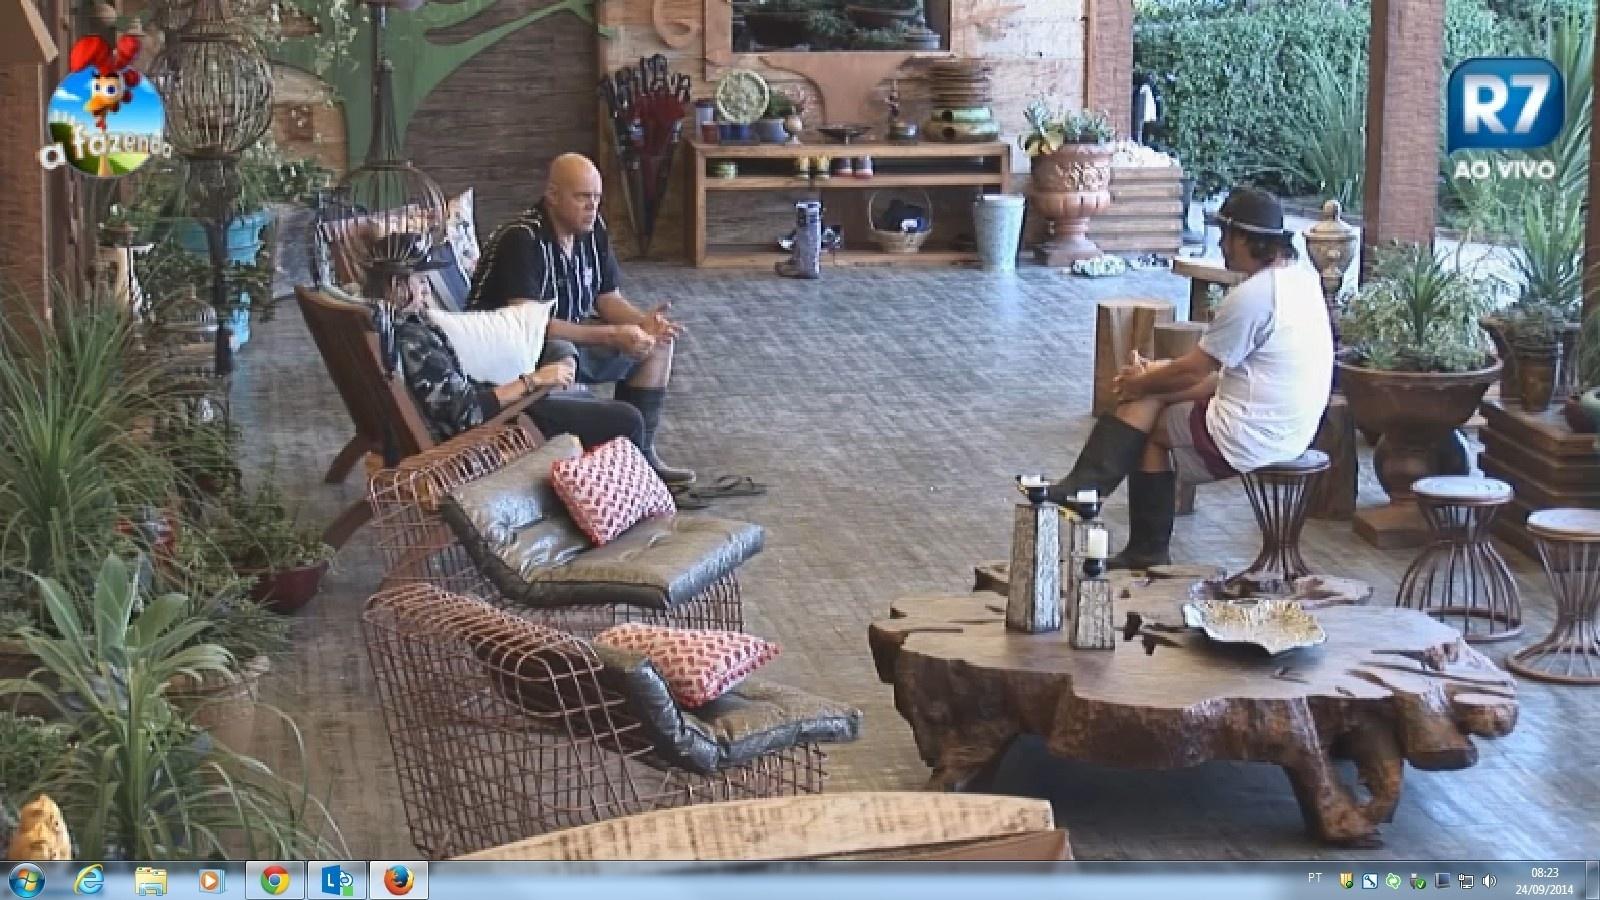 24.set.2014 - Oscar Maroni conversa com Roy e DH